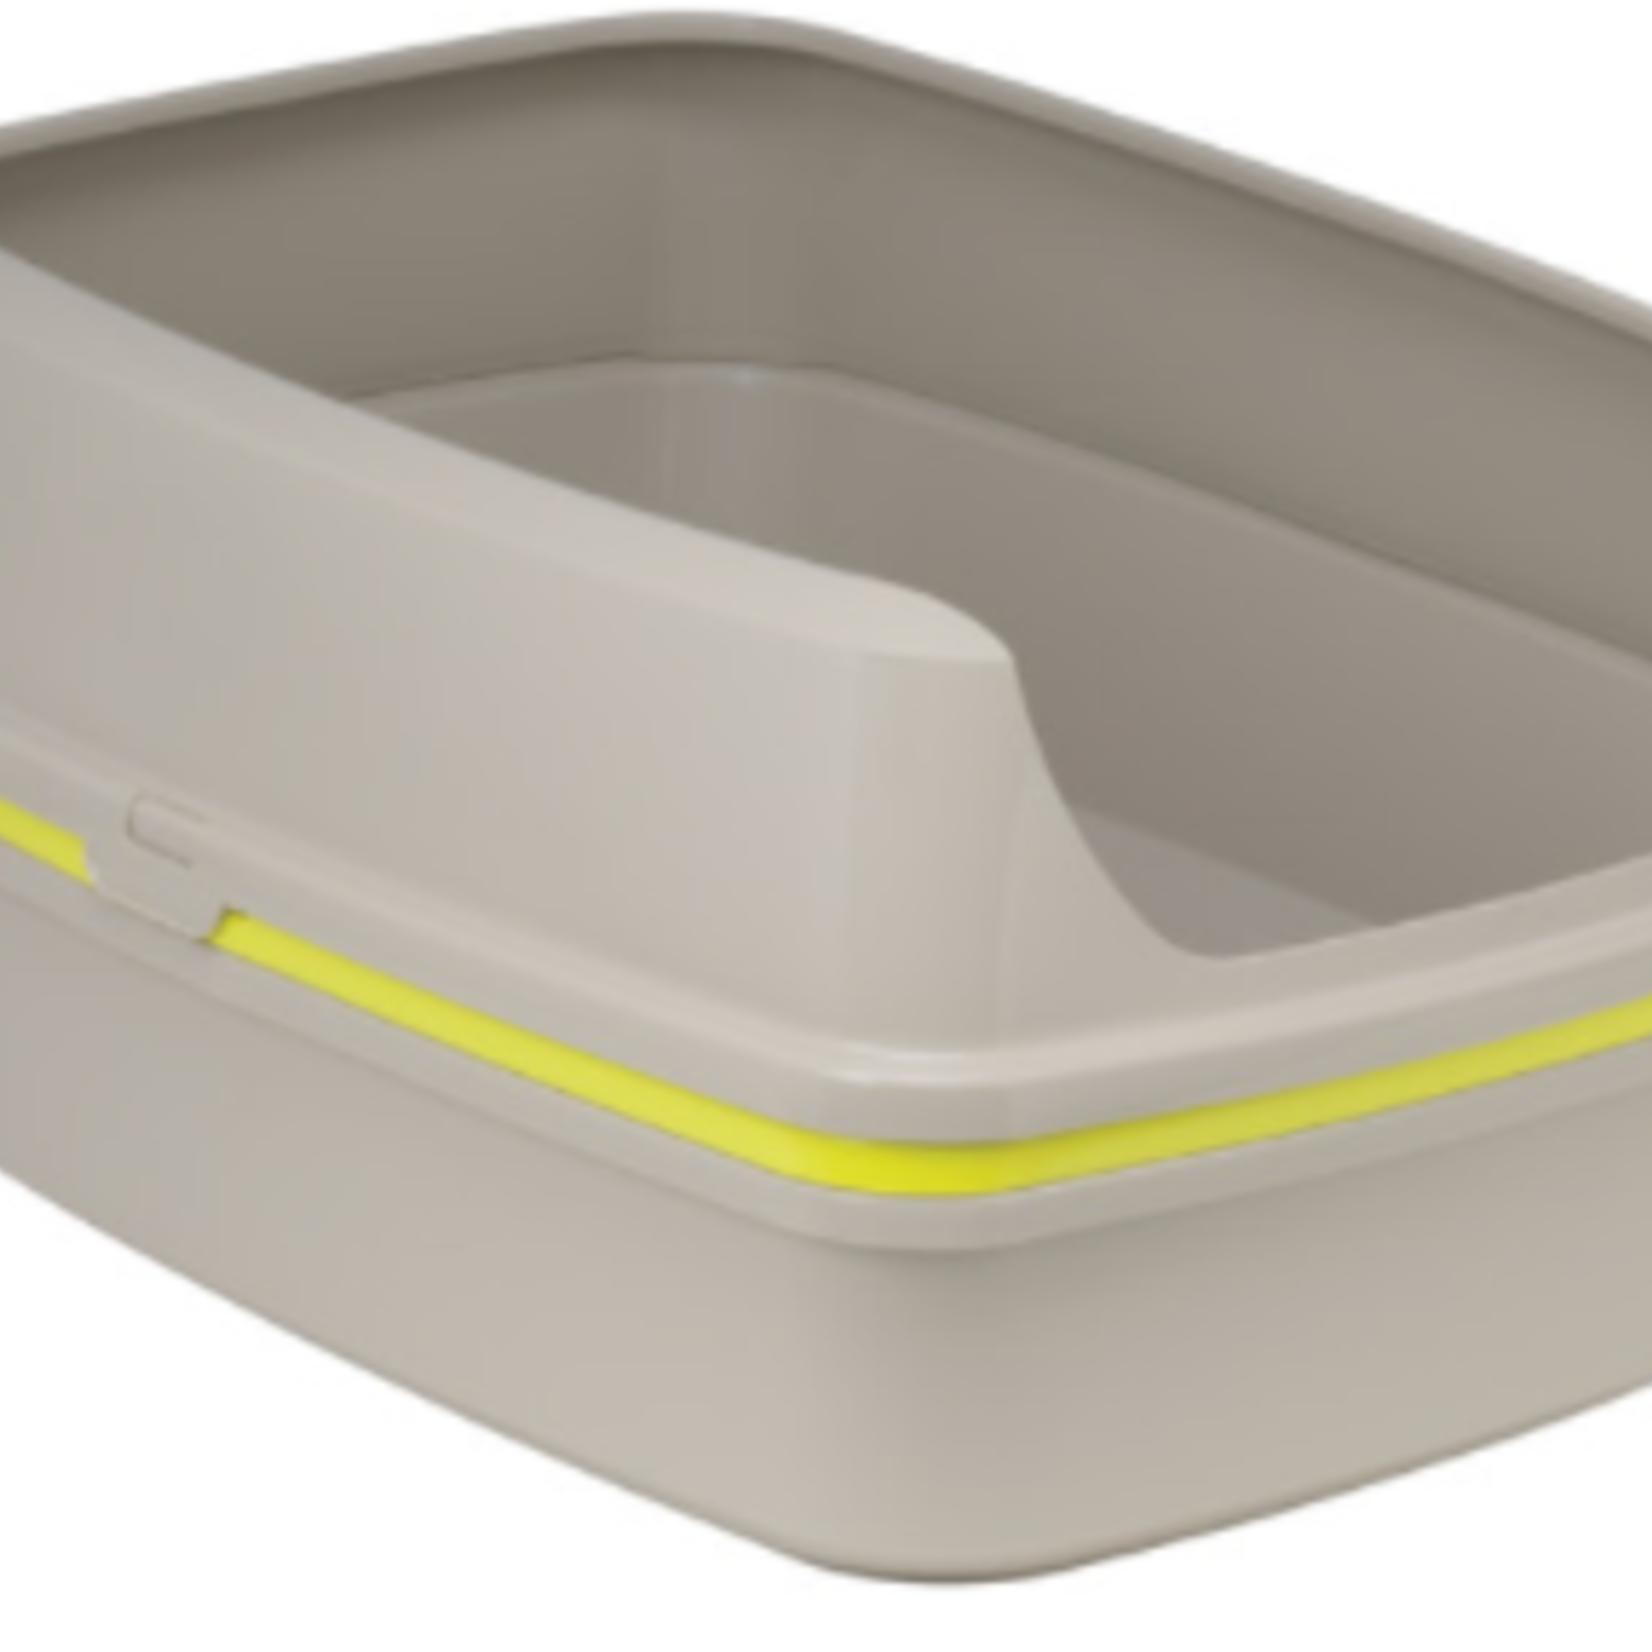 Moderna Litter Box-Lift to Sift-Jumbo-Warm Grey & Lemon